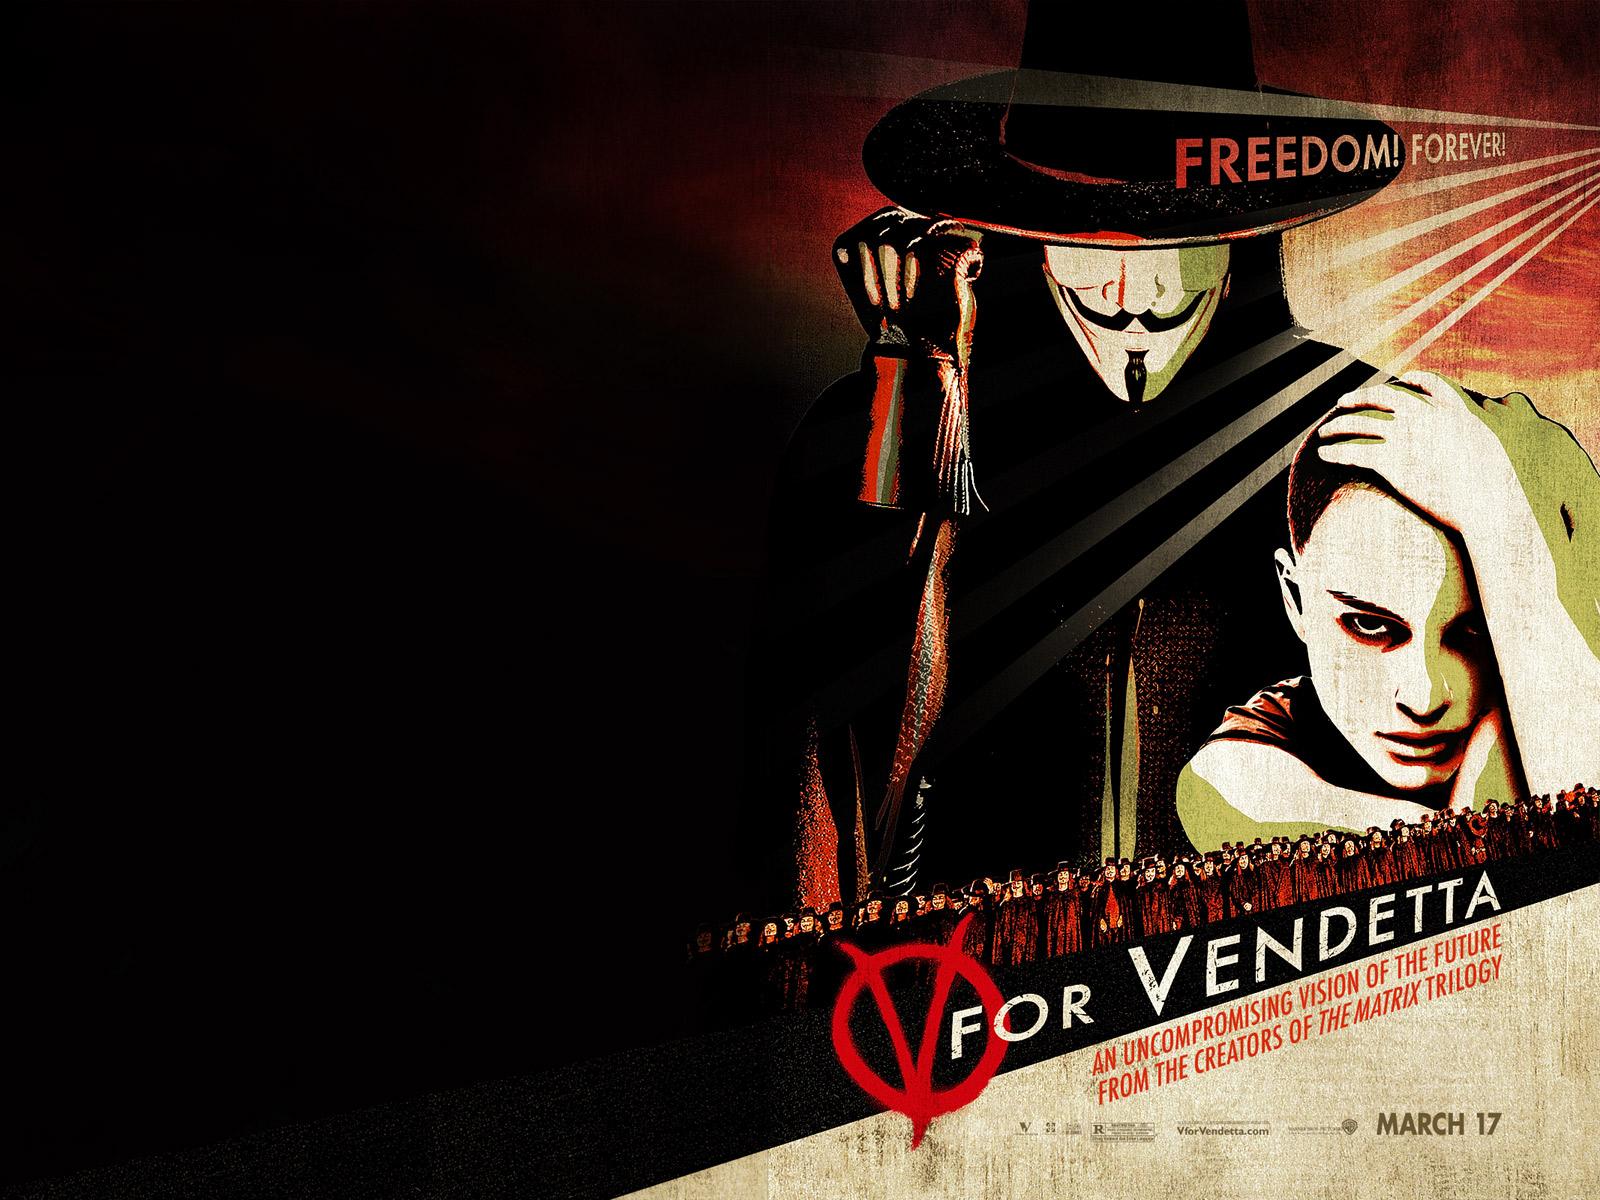 V For Vendetta Movie Wallpaper V For Vendetta Compute...